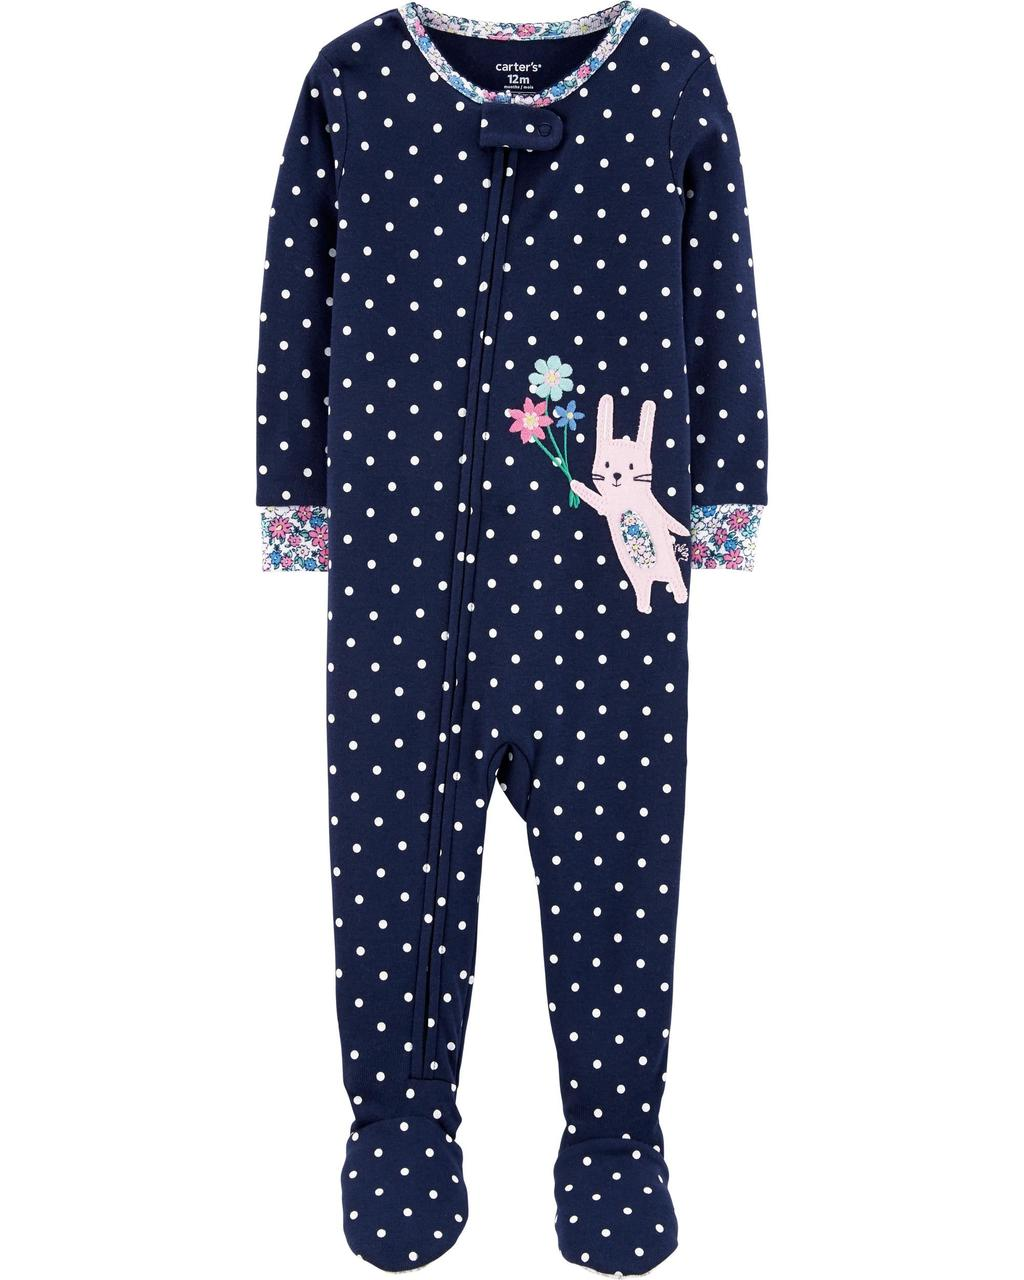 Пижама Carter's темно-синяя 18m(78-83cm) (250/569)